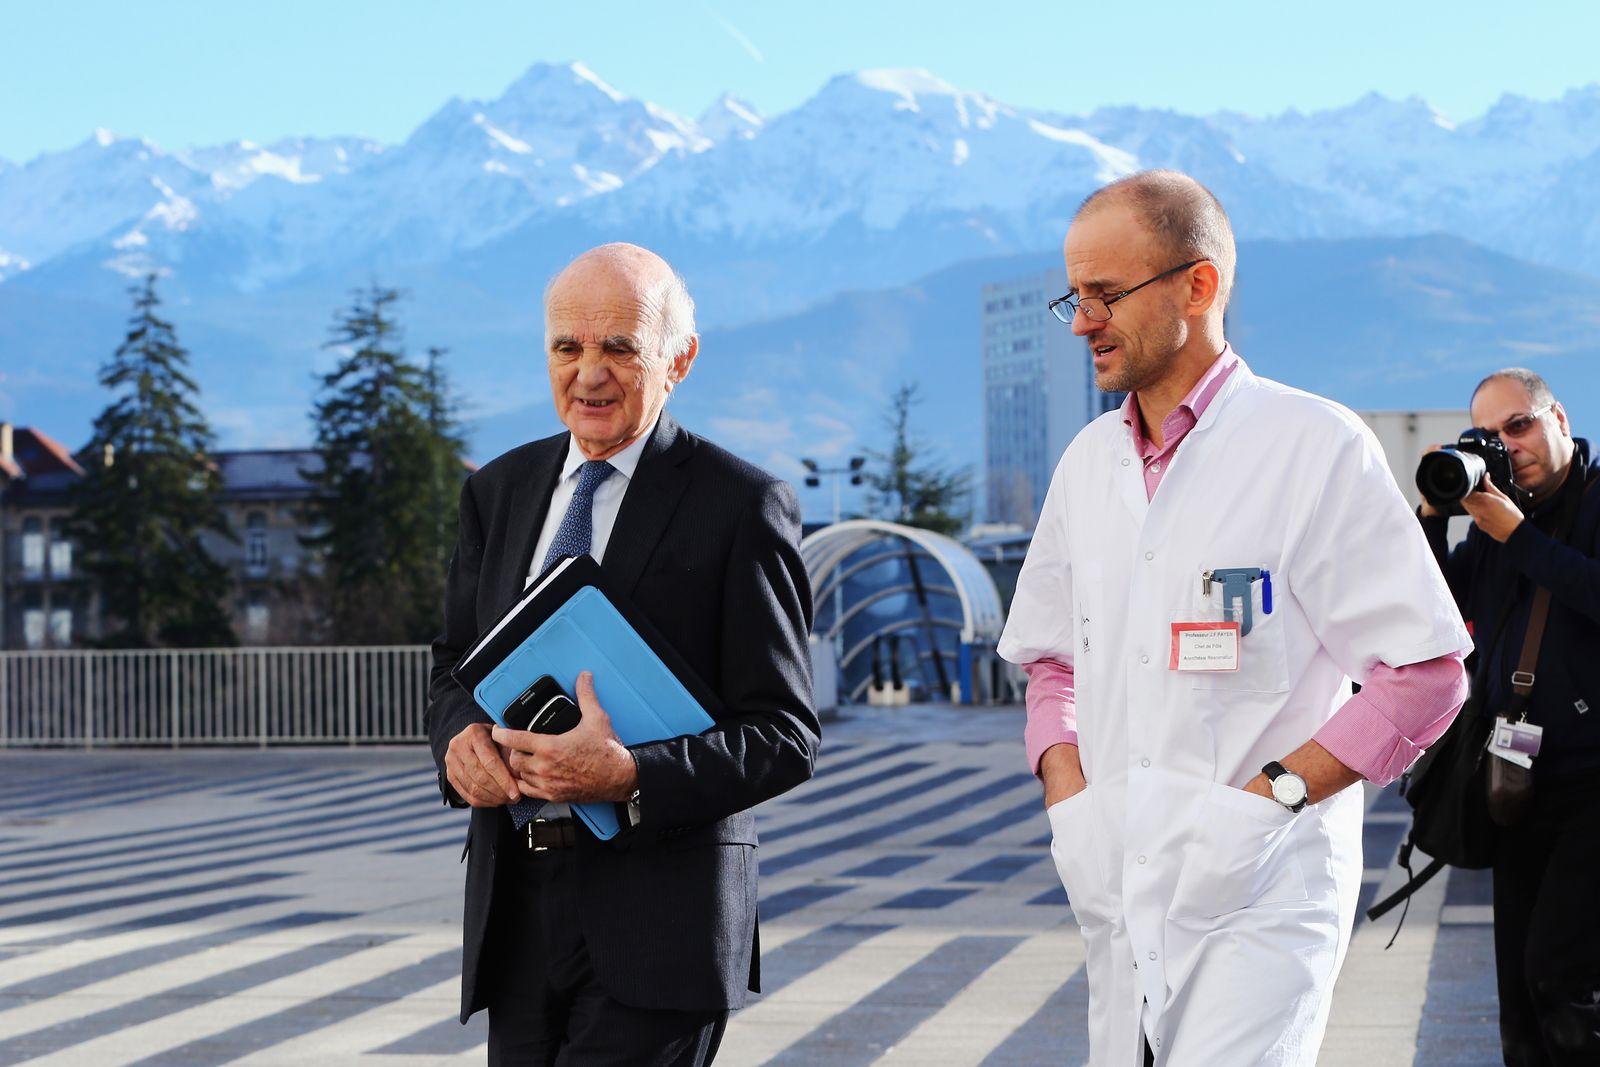 Schumacher / Unfall / Gerard Saillant / Jean-Francois Payen